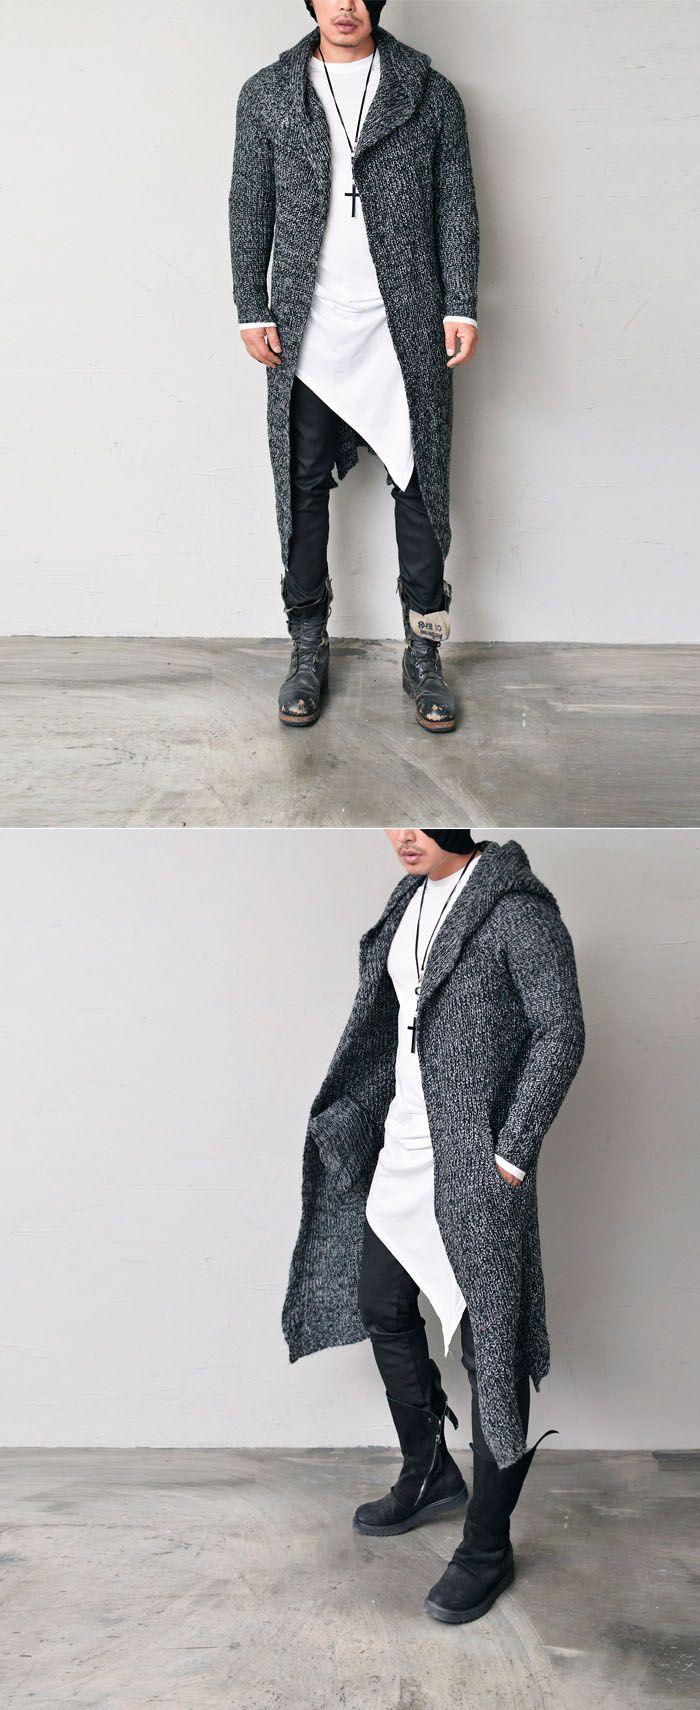 Marled Long Hood Jacket-Cardigan 189 by. Guylook.com  Great quality soft acrylic blends Warm & cozy yet must-have stylish jacket Generously sized to flatter most any body shape